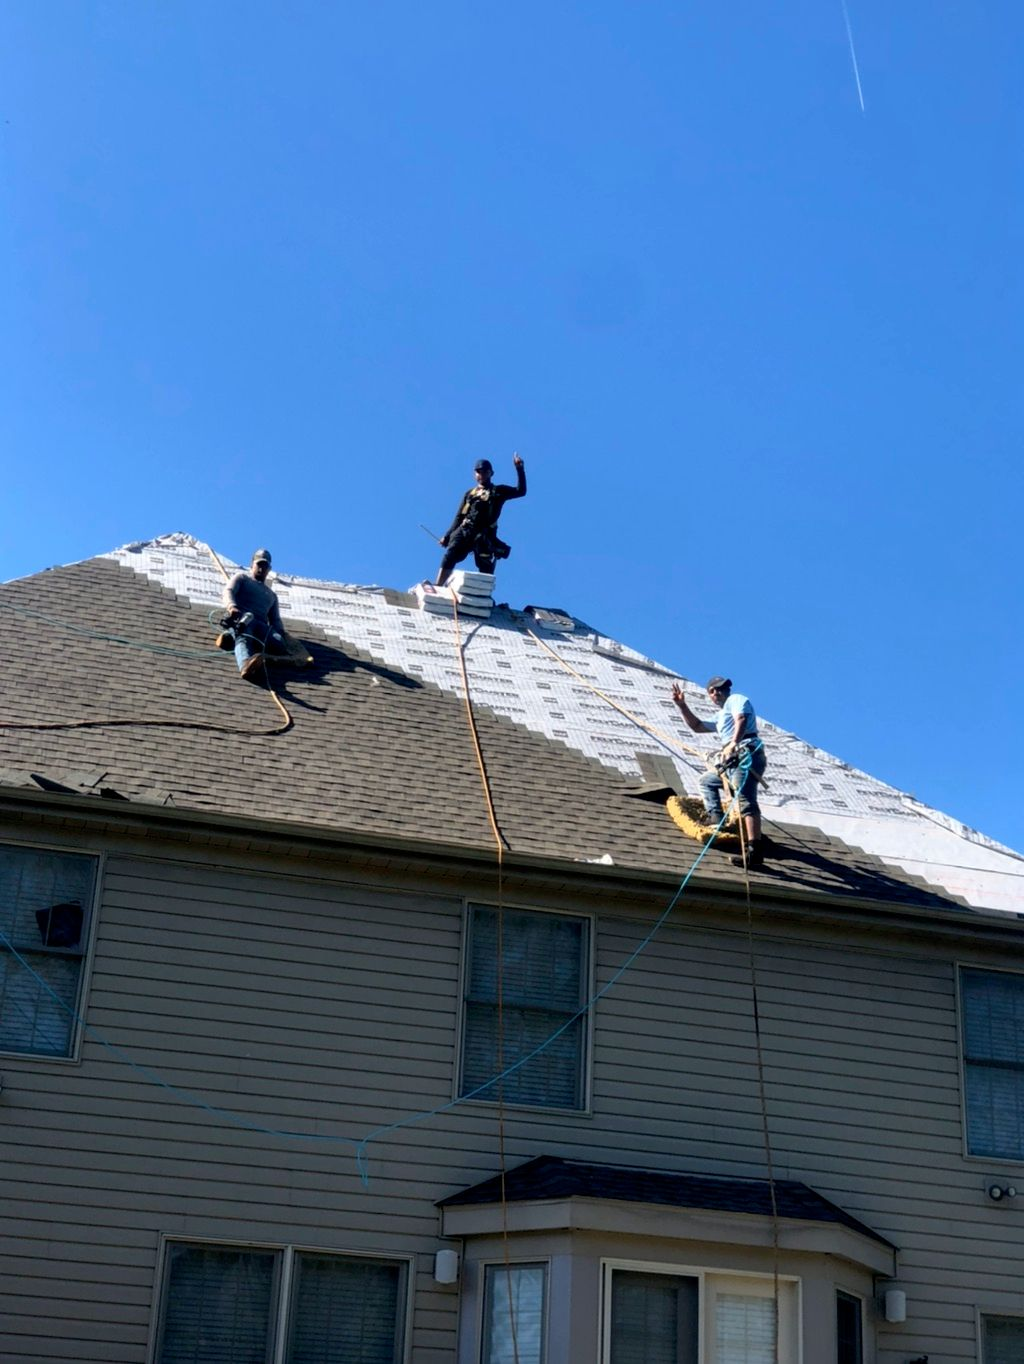 Dynasty Construction & Repairs, LLC